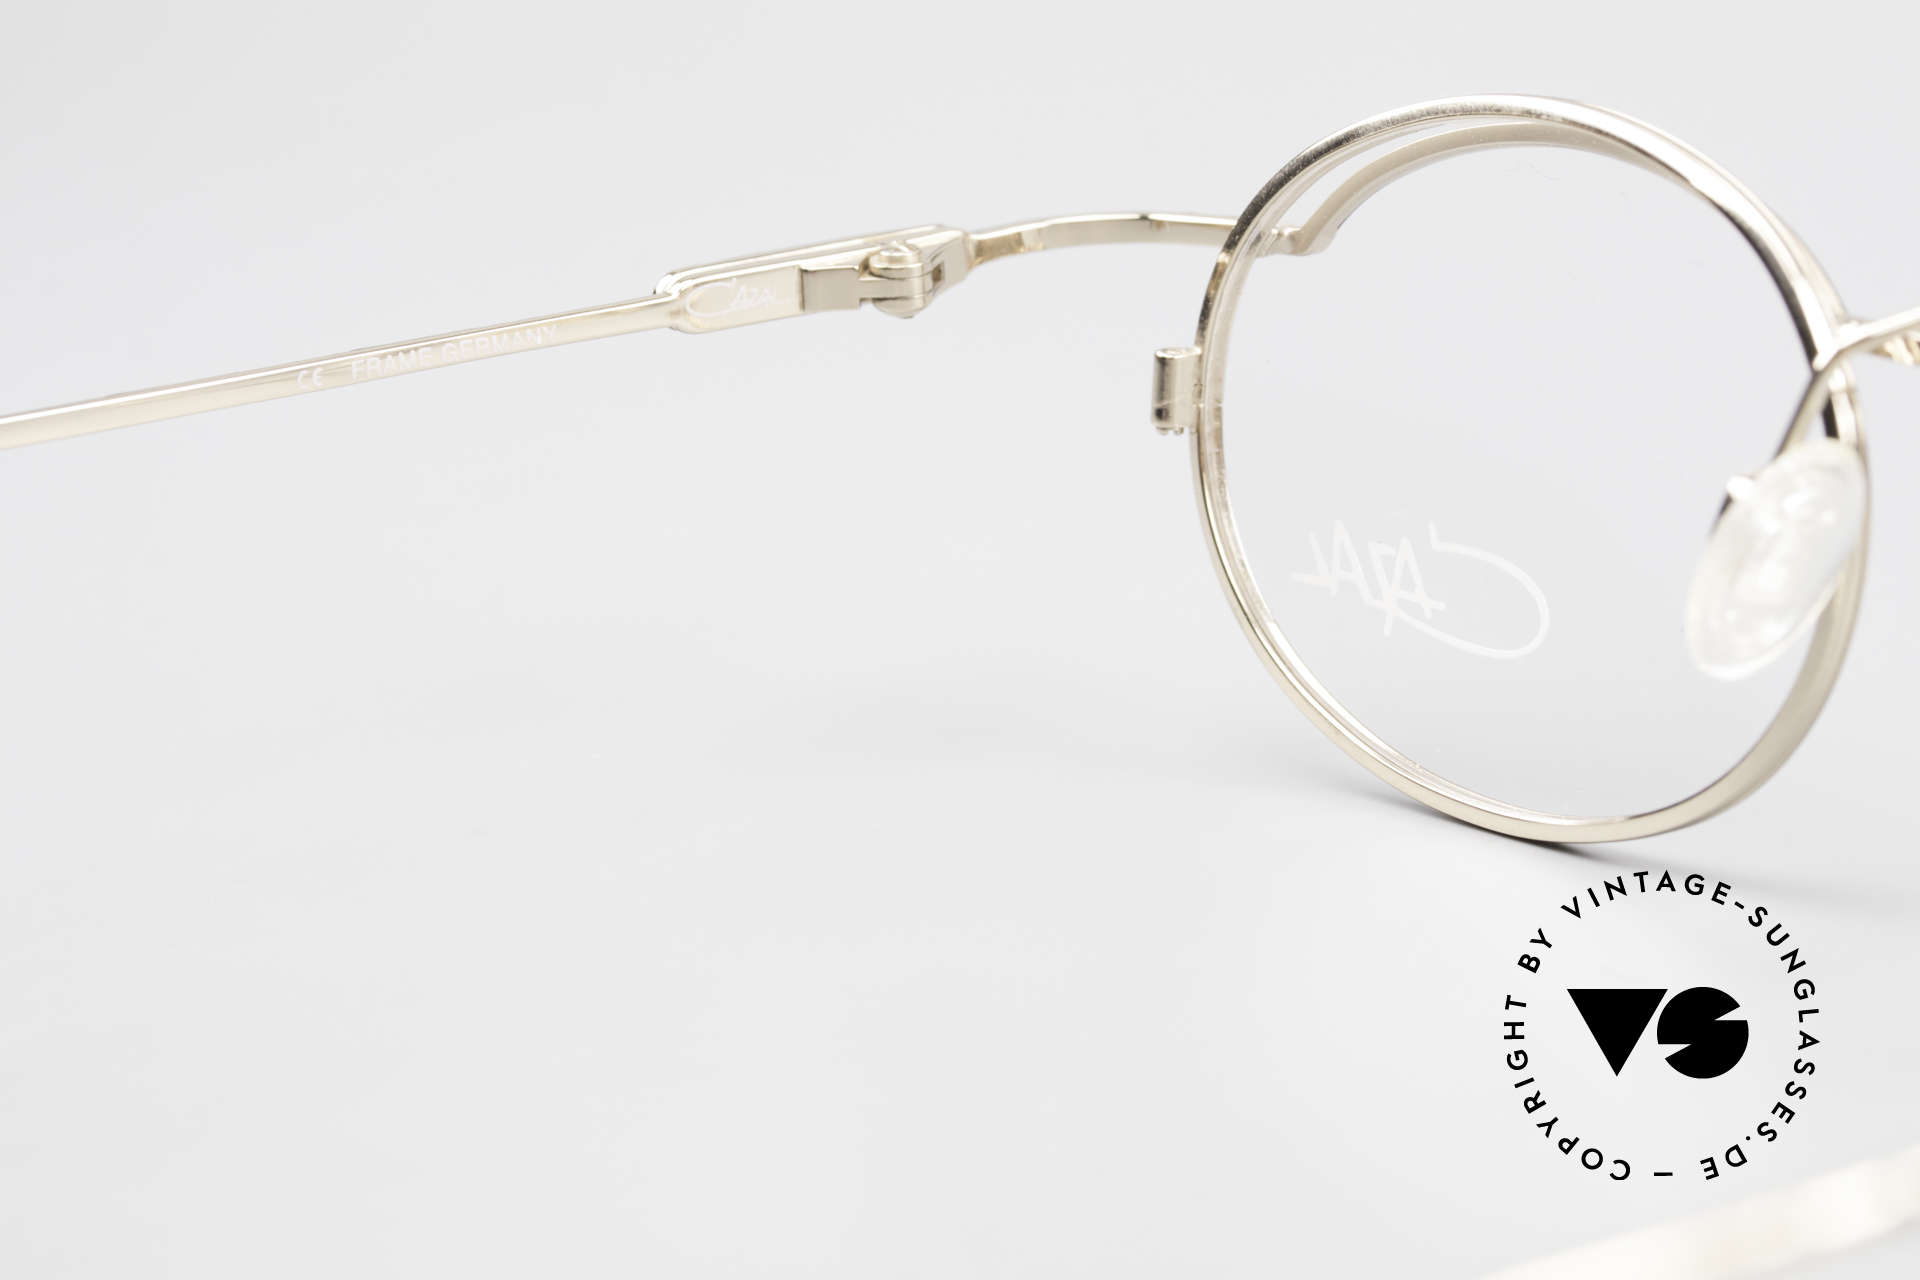 Cazal 775 Rare Oval 1990's Eyeglasses, frame is made for lenses of any kind (optical / sun), Made for Men and Women